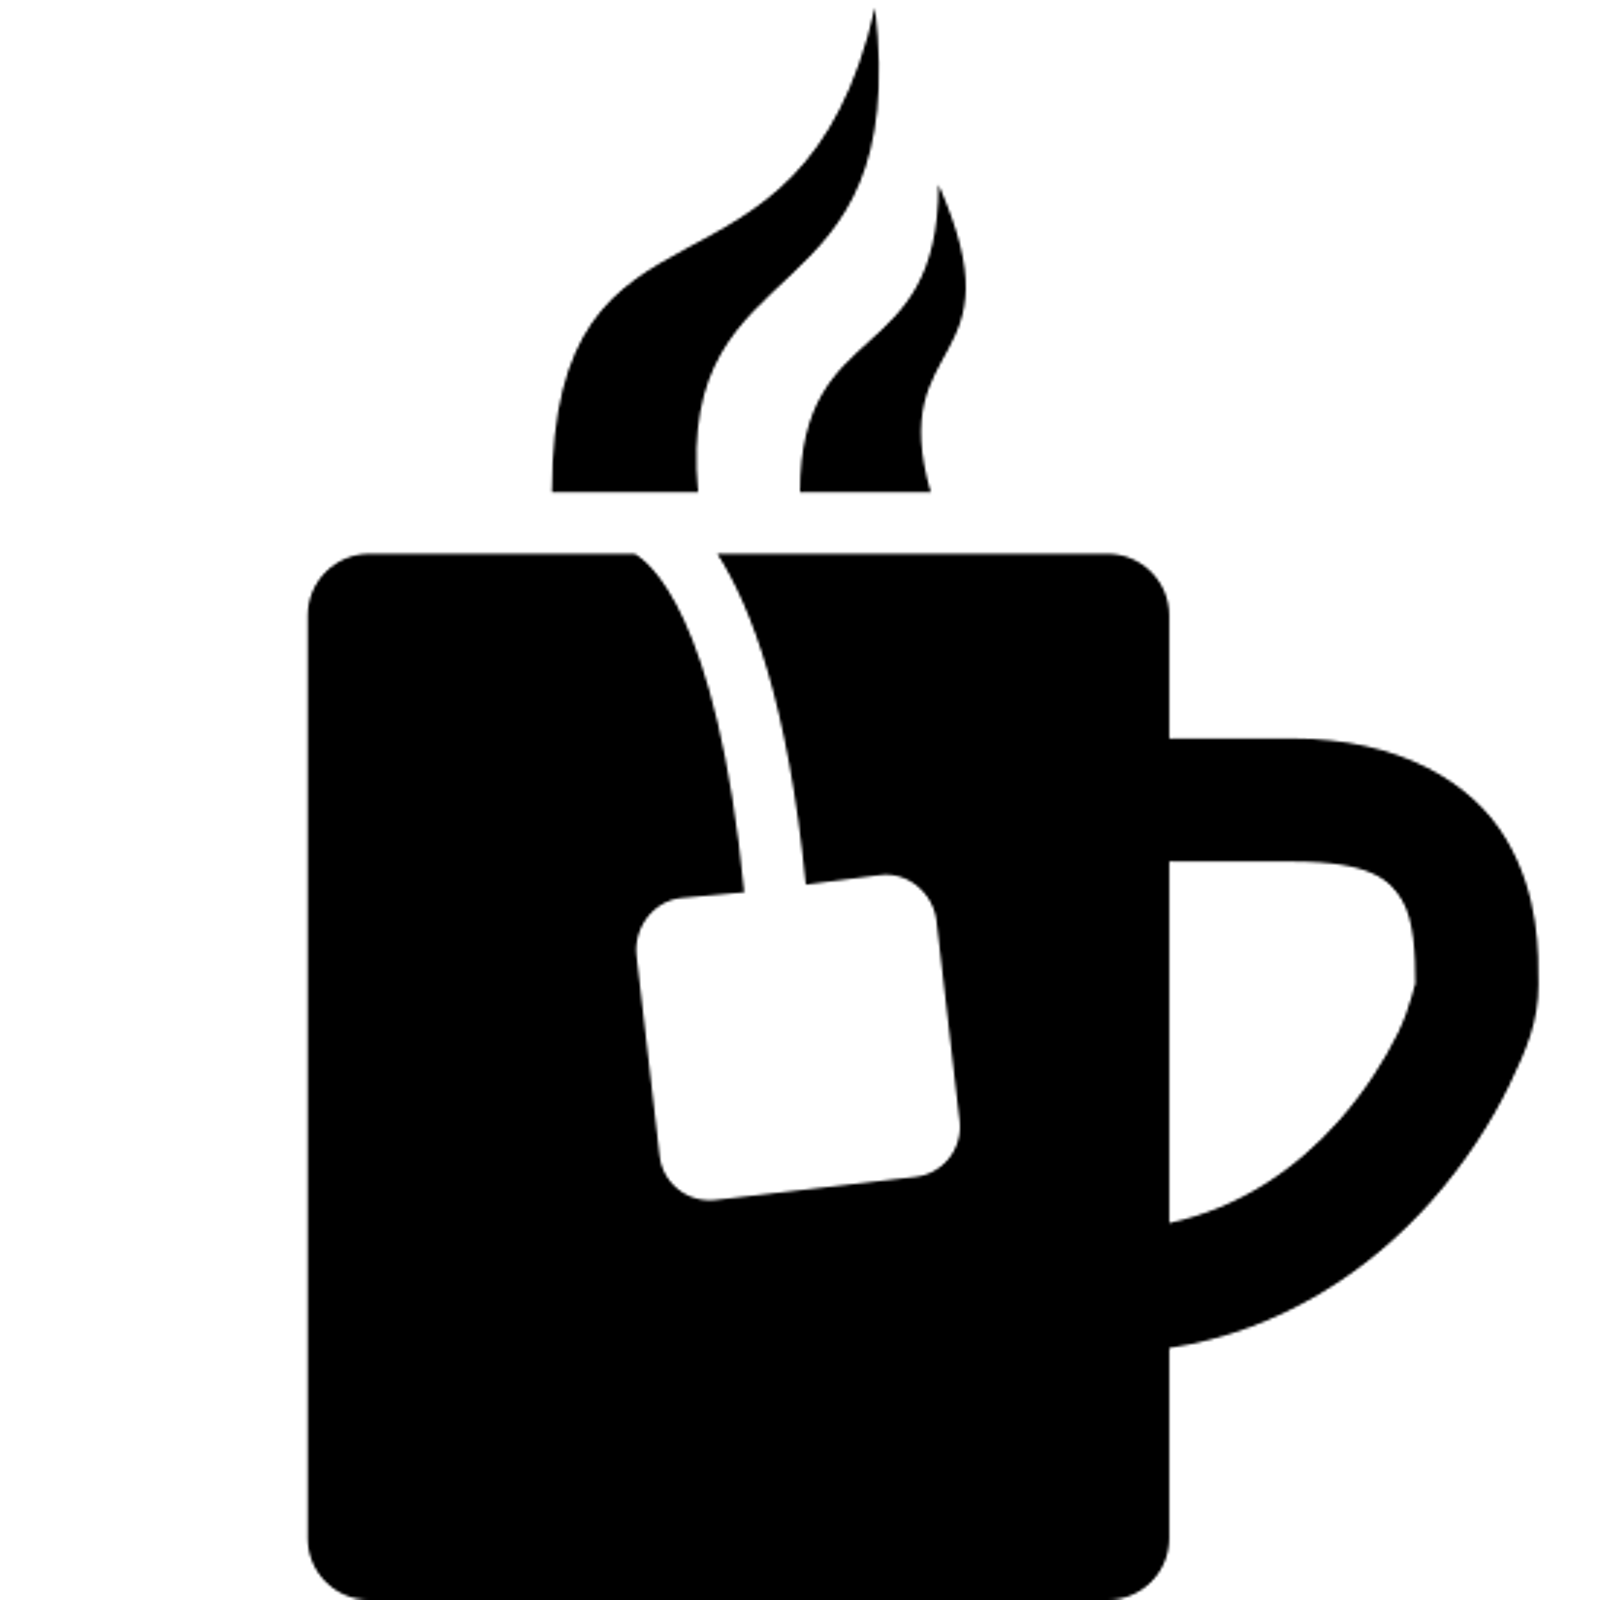 Herbata icon